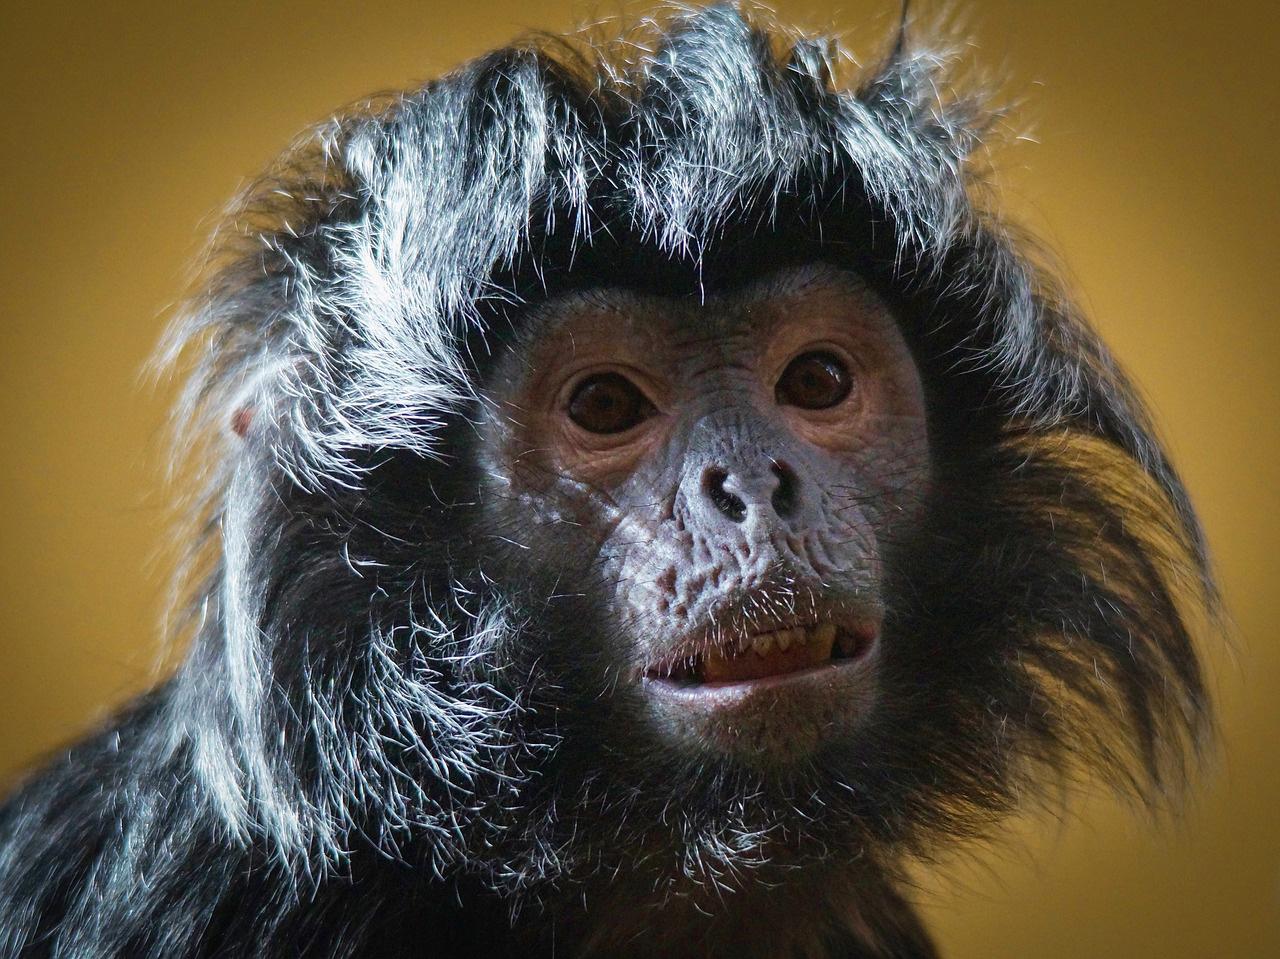 Monkey with wild hair.